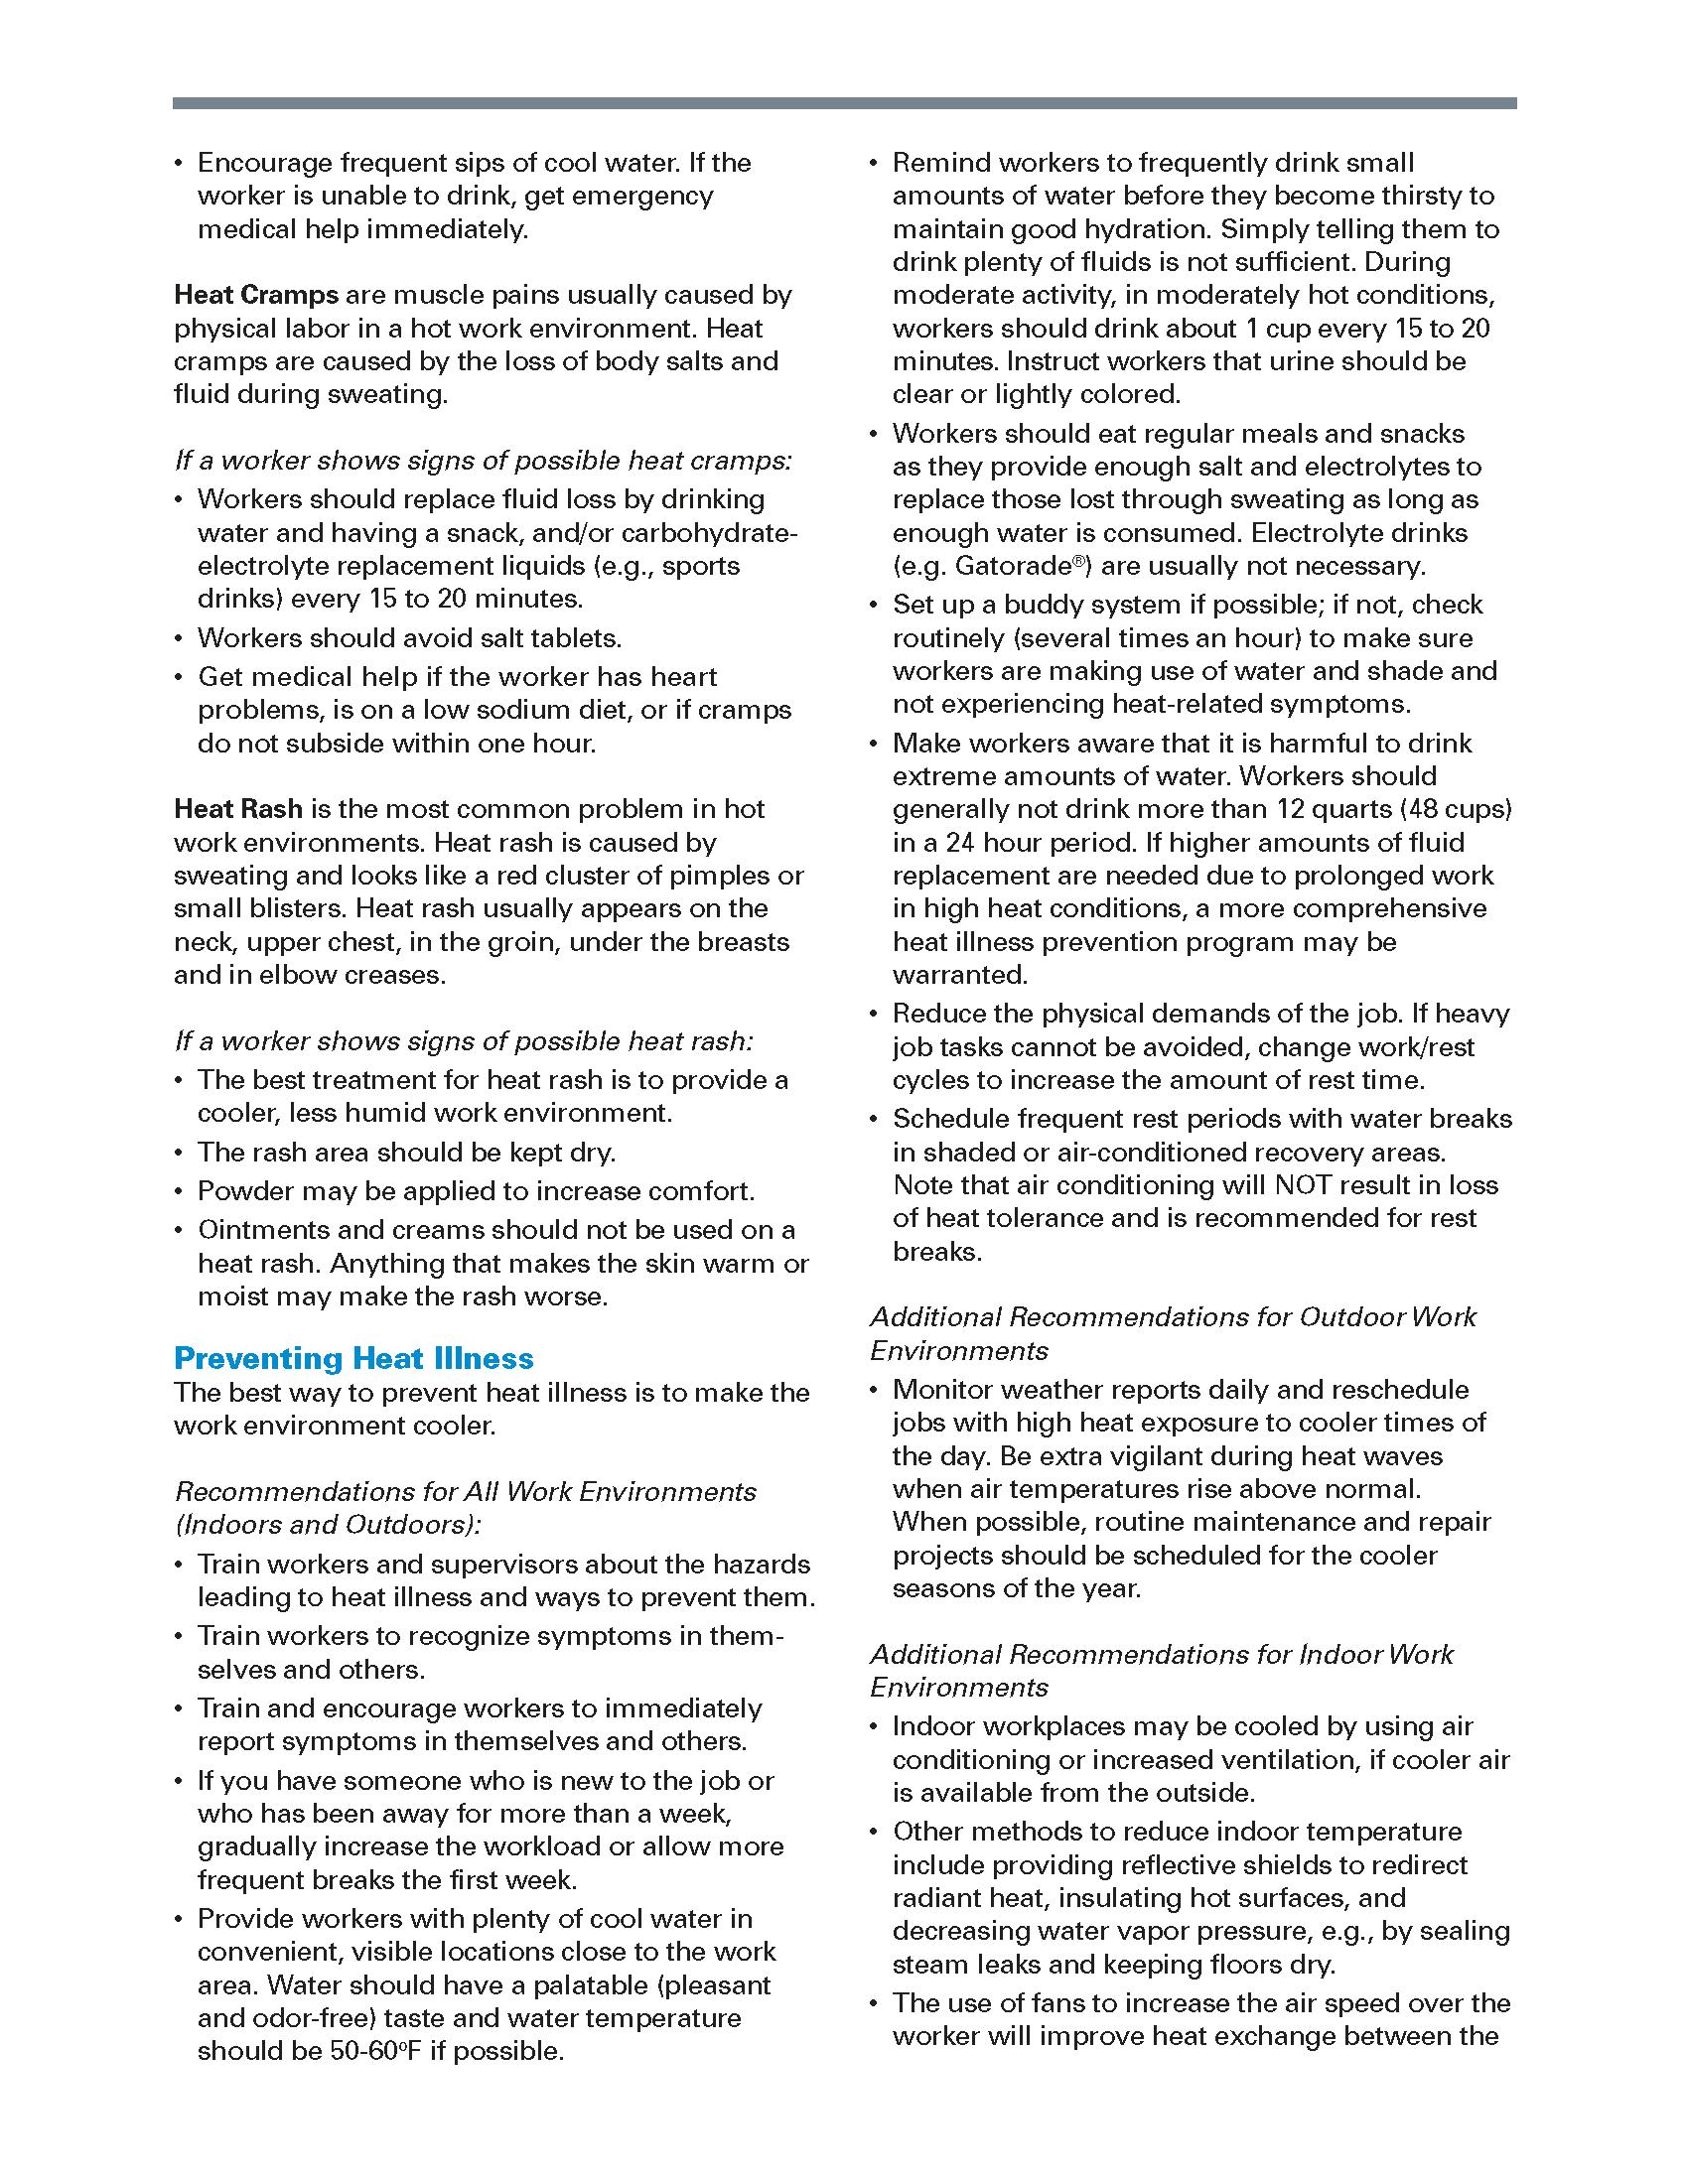 http://www.ibew683.org/Uploads/UploadedFiles/2019_OSHA_Heat_Stress_Fact_Sheet_Page_2